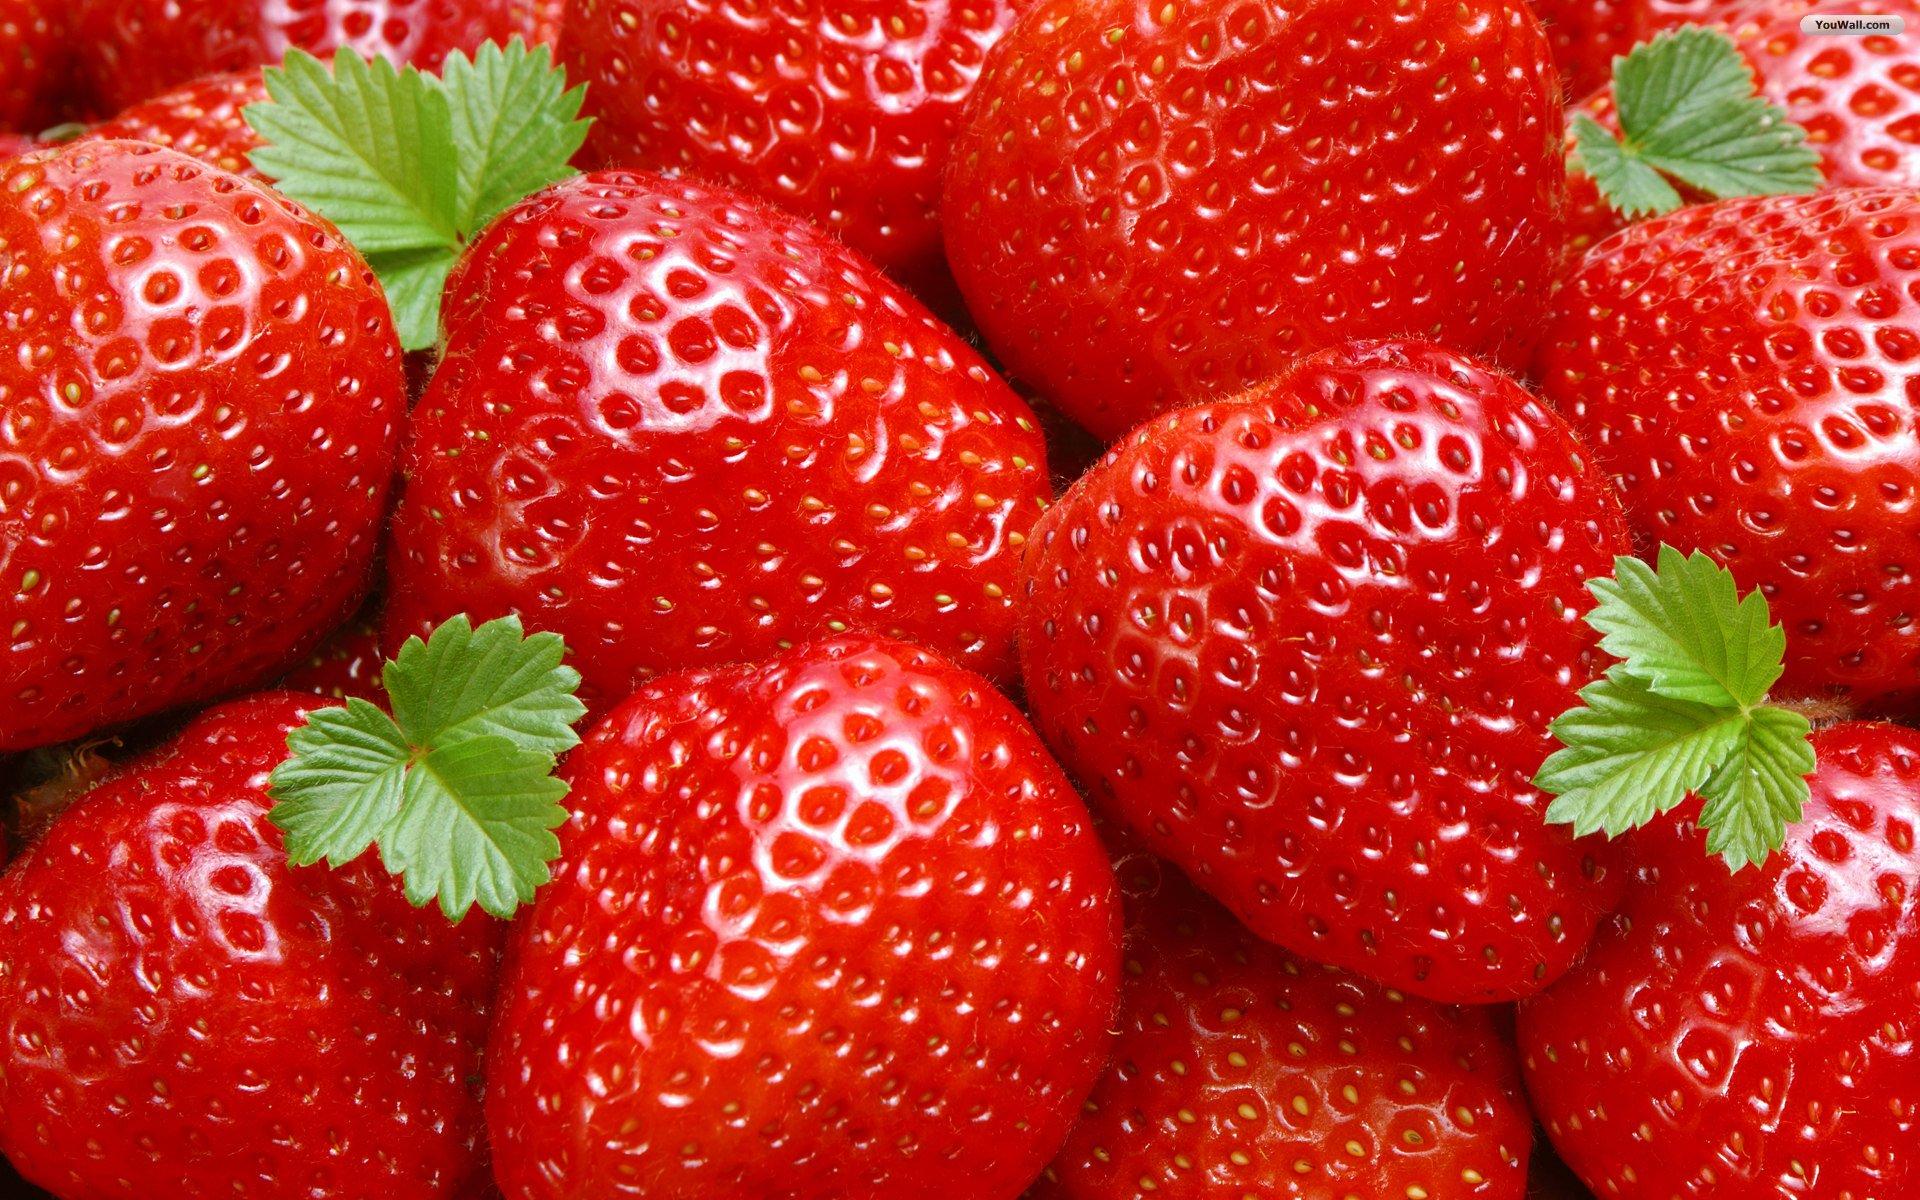 beautiful strawberries hd wallpapers cool desktop background images widescreen